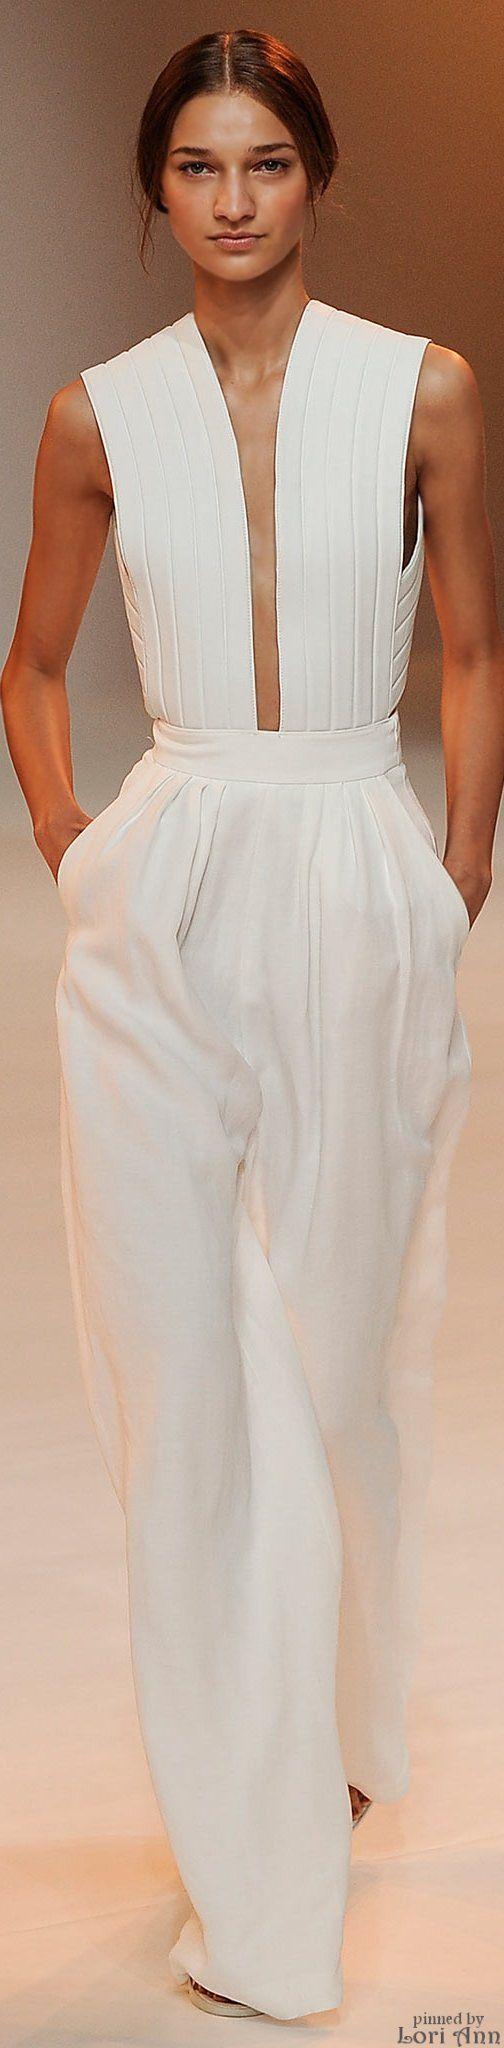 #fashion #style #runway